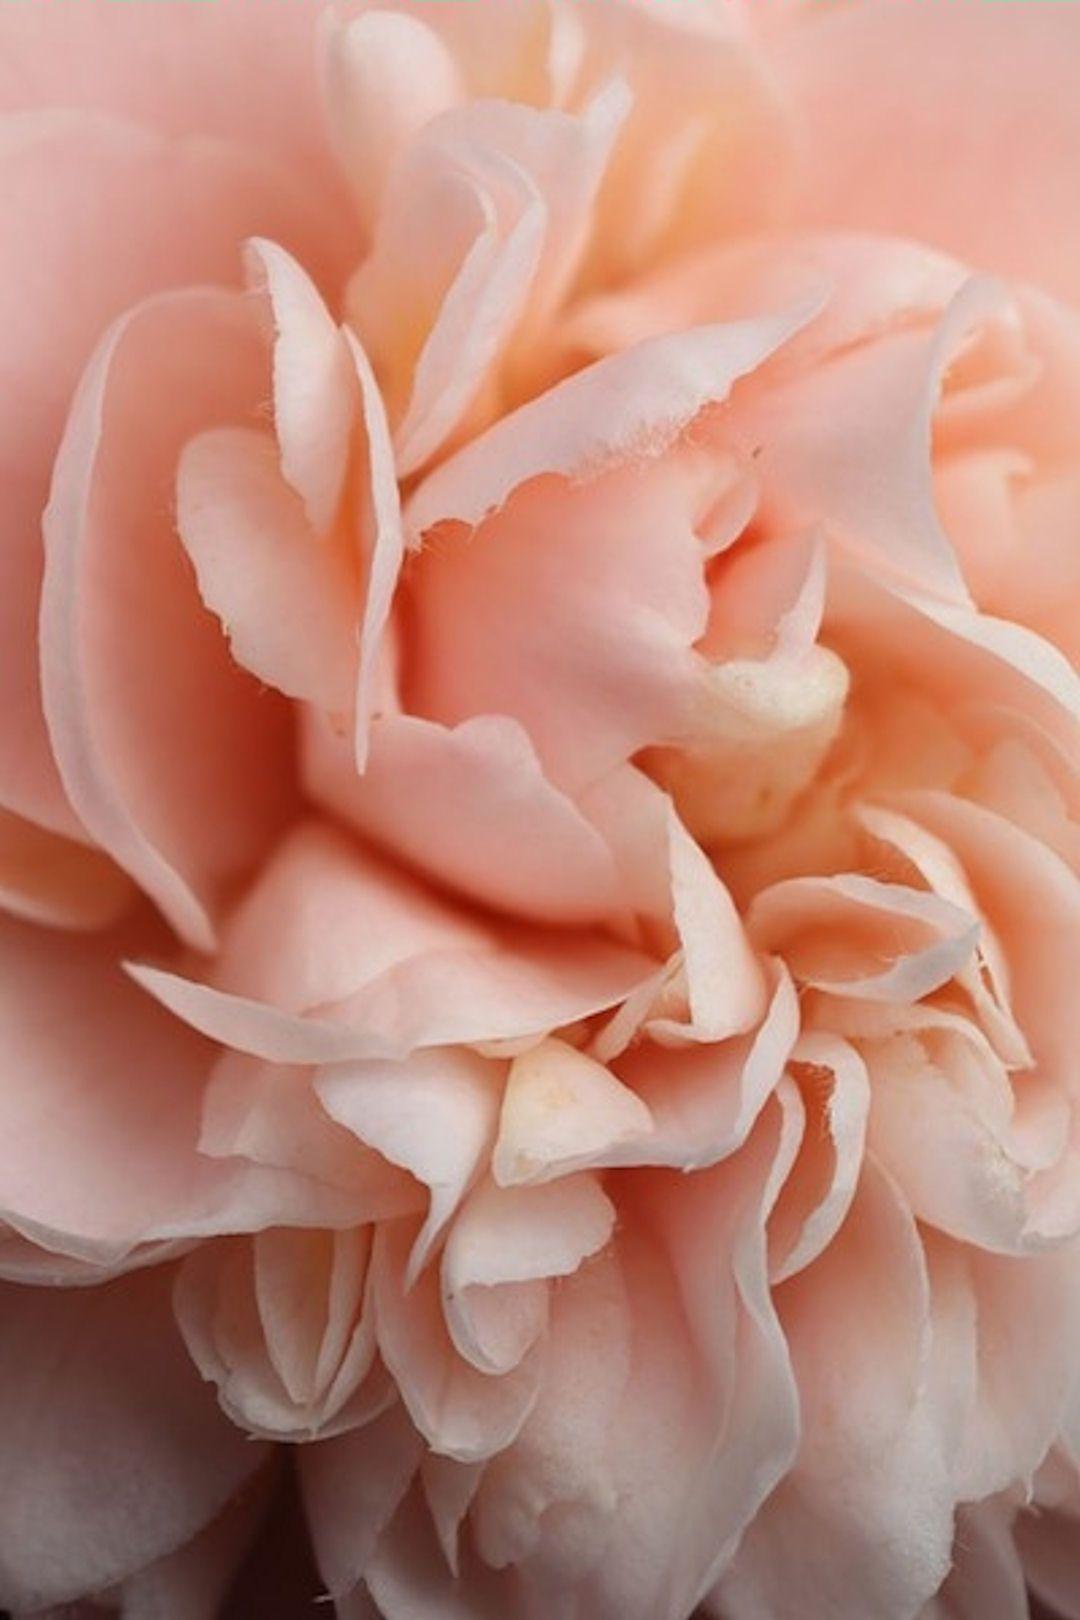 Such Pretty Soft Pink Petals | Flower Love | Pinterest